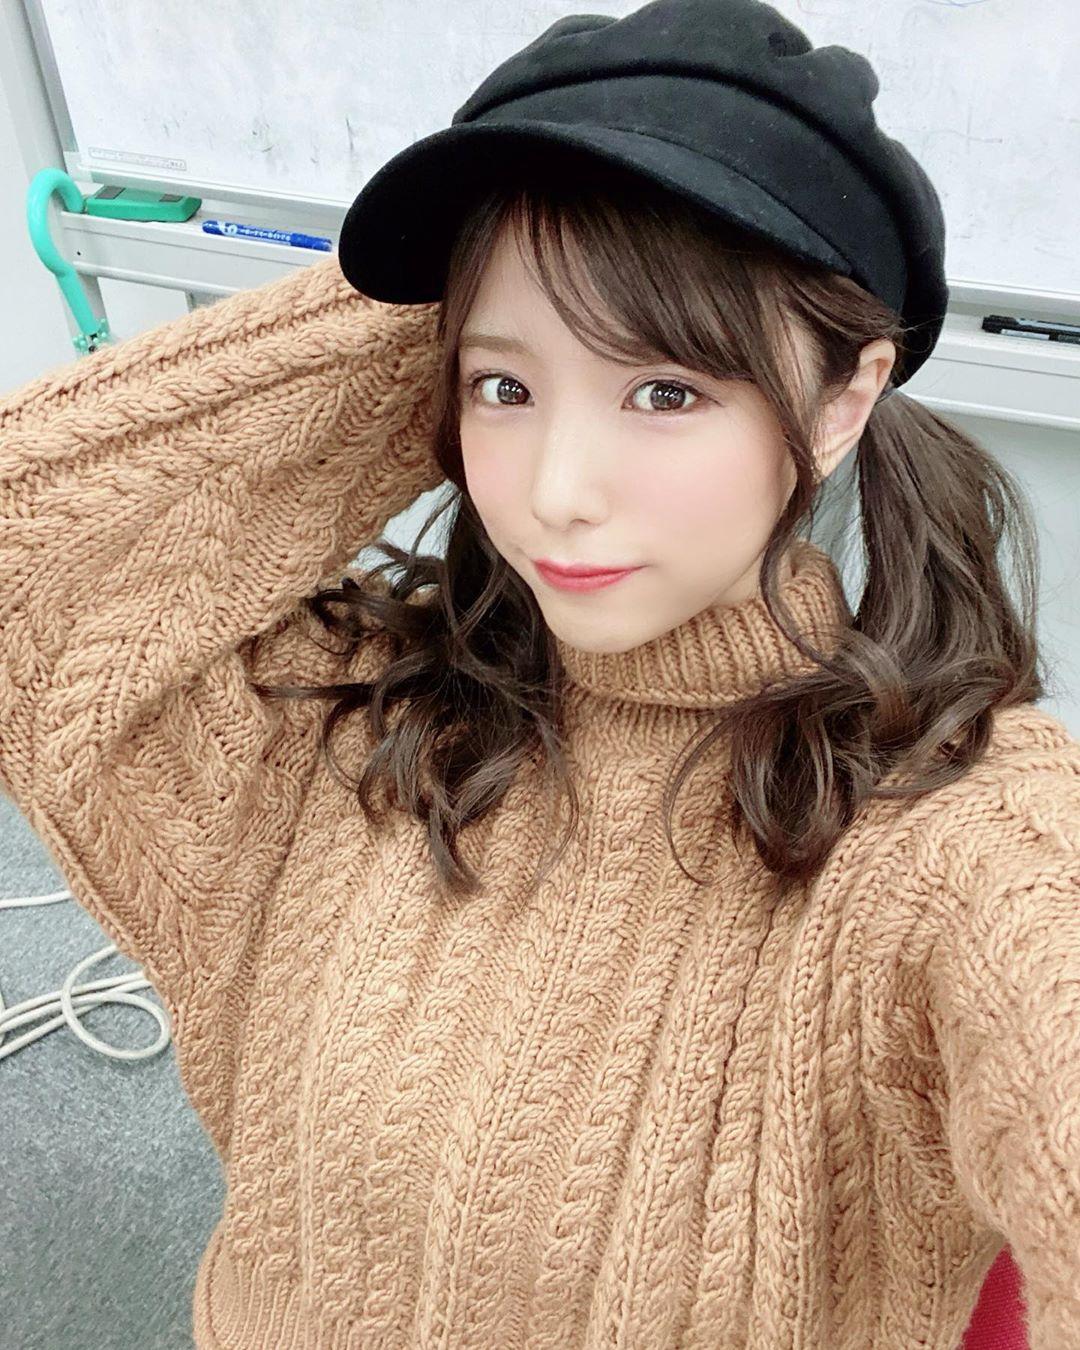 matsumoto_asami028.jpg